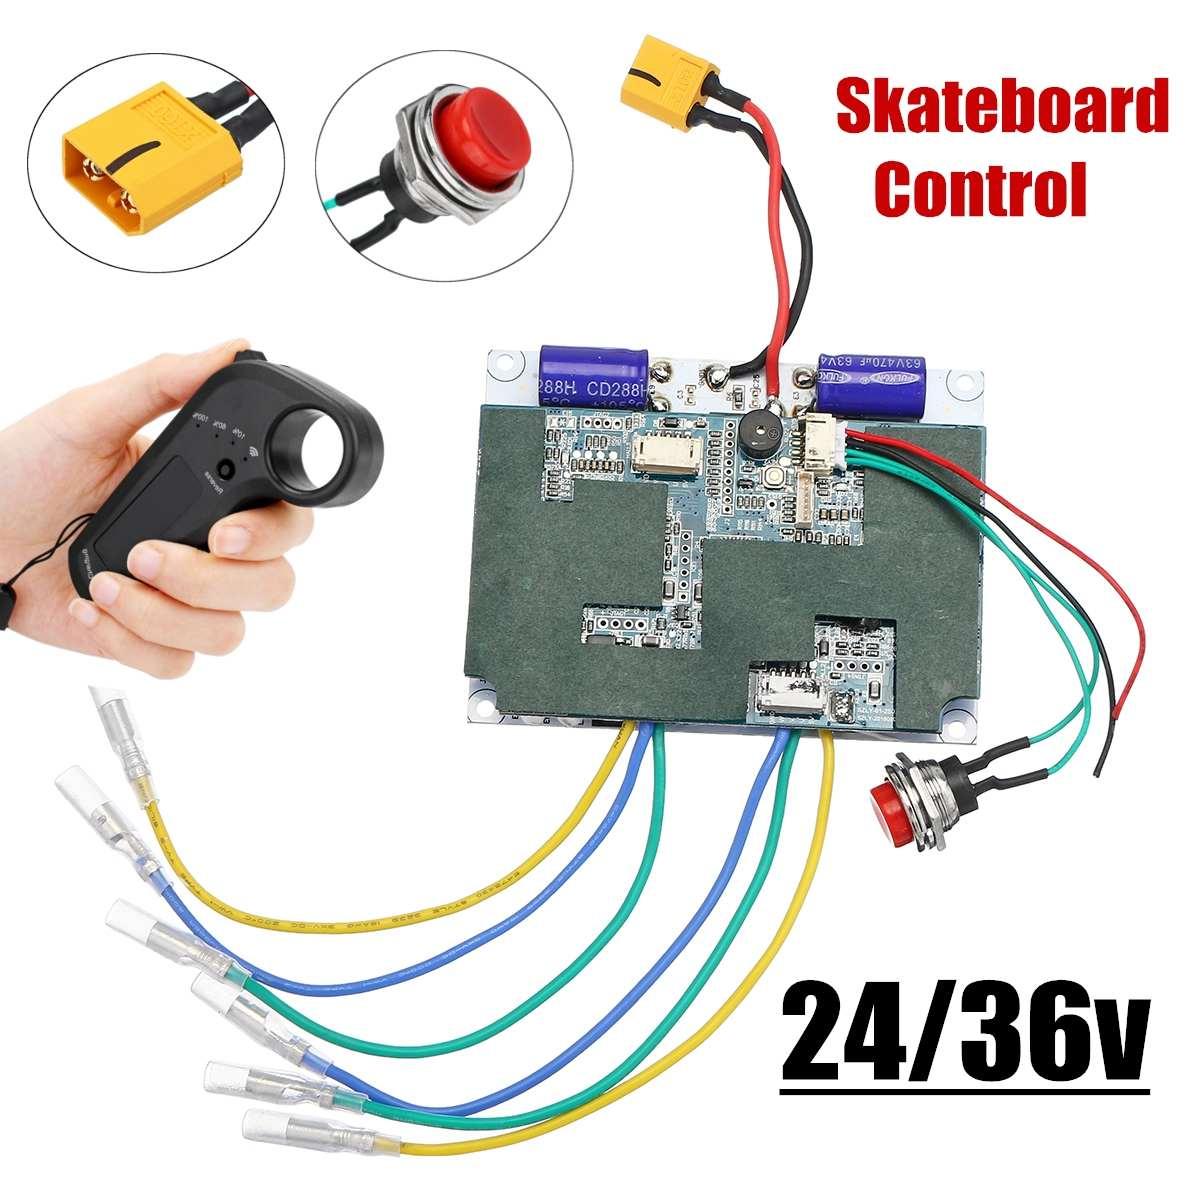 24V/36V Electric Skateboard Controller Longboard Remote Dual Motors ESC Substitute Parts Scooters Skate Board Accessories